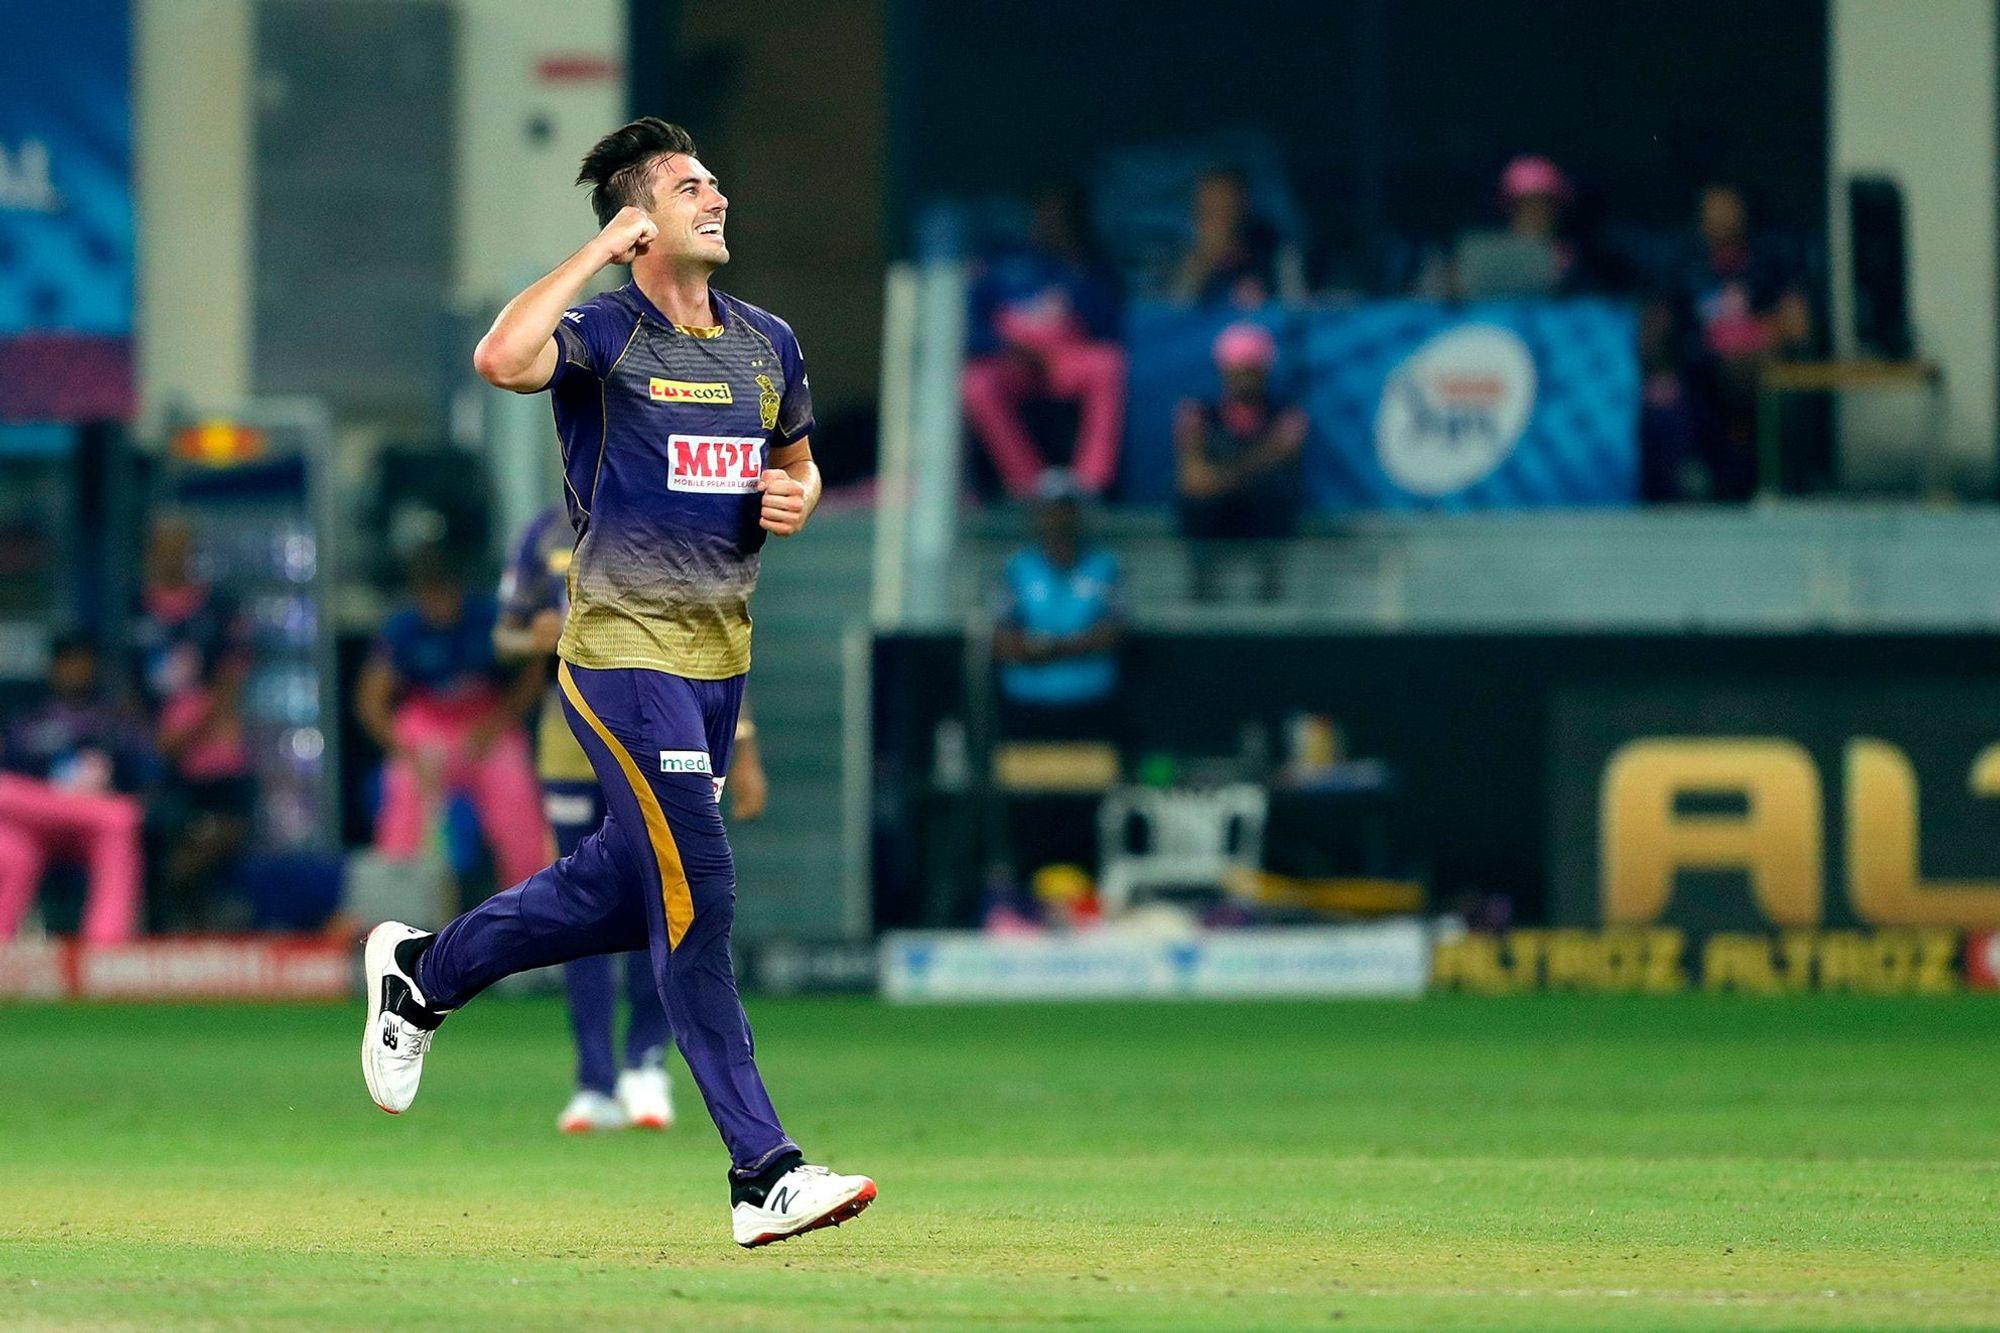 Man of the Match Pat Cummins took 4 wickets against RR in Dubai (Photo - BCCI / IPL)